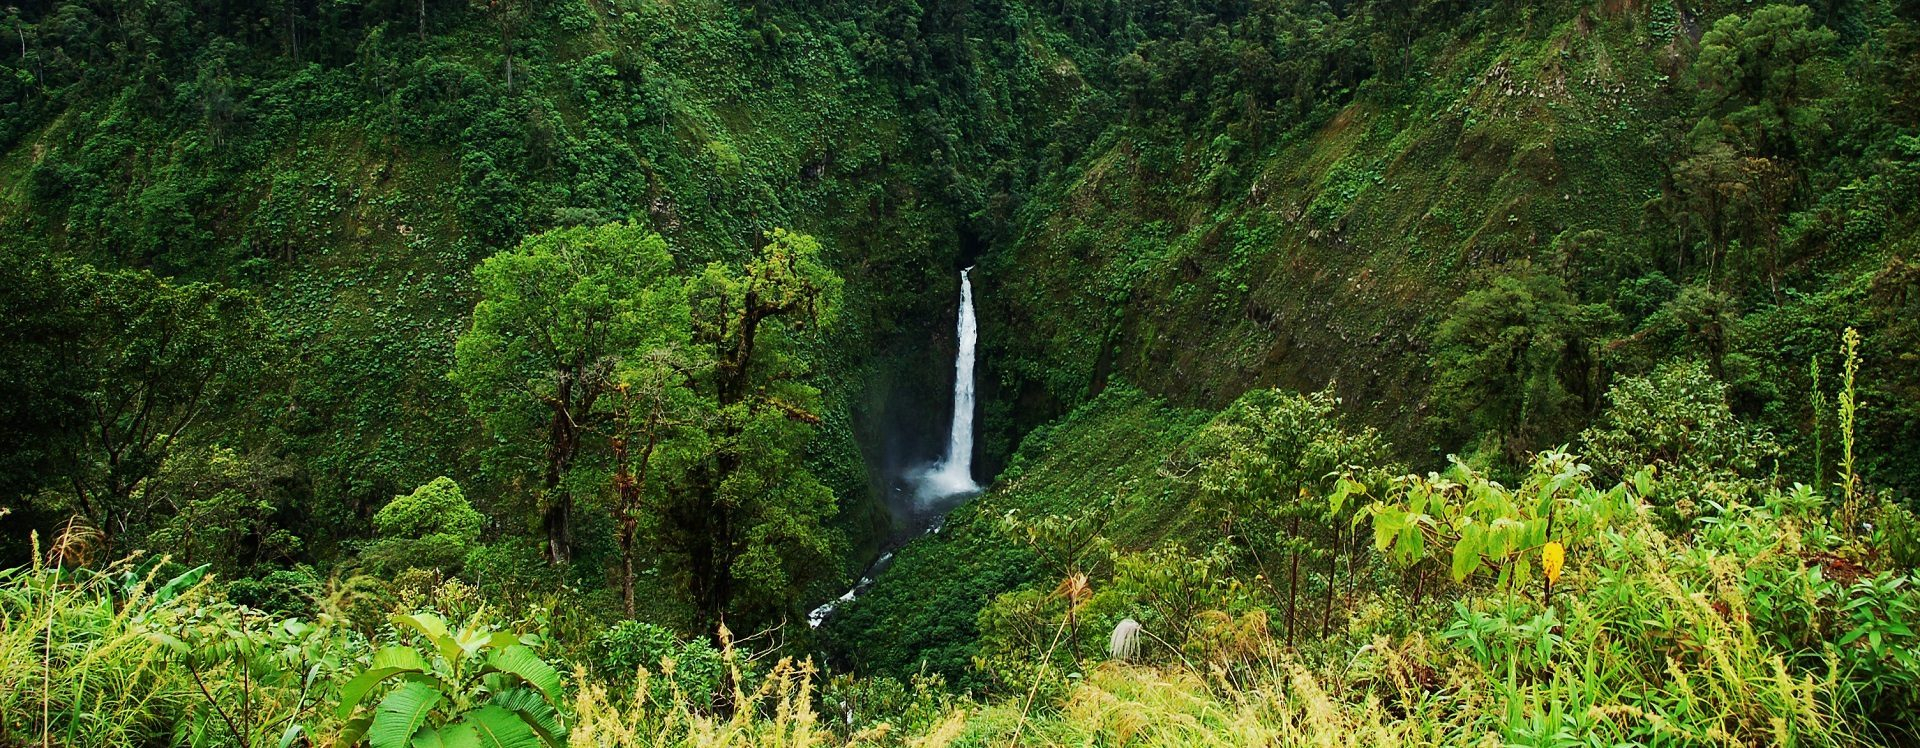 Sarapiquí Wasserfall in Costa Rica